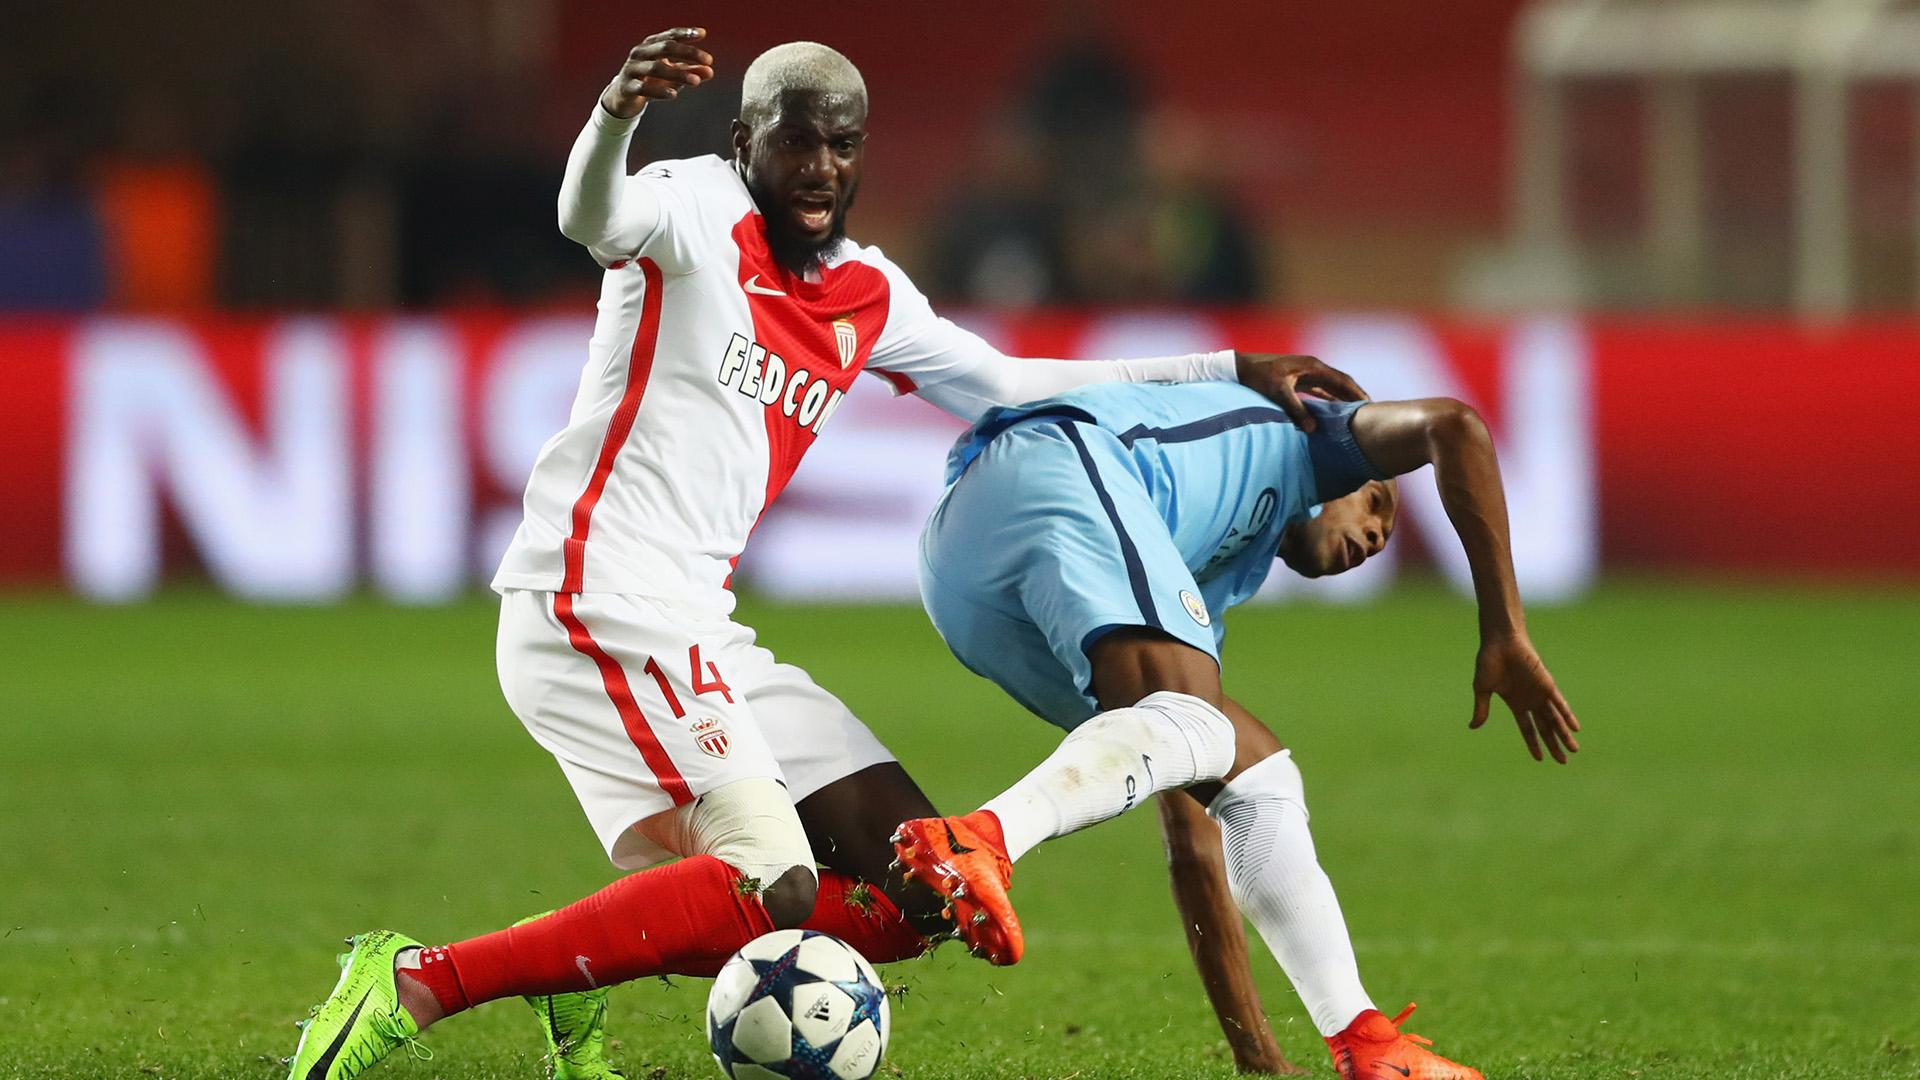 Tiemoue Bakayoko Fernandinho Monaco Manchester City Champions League R16 15032017